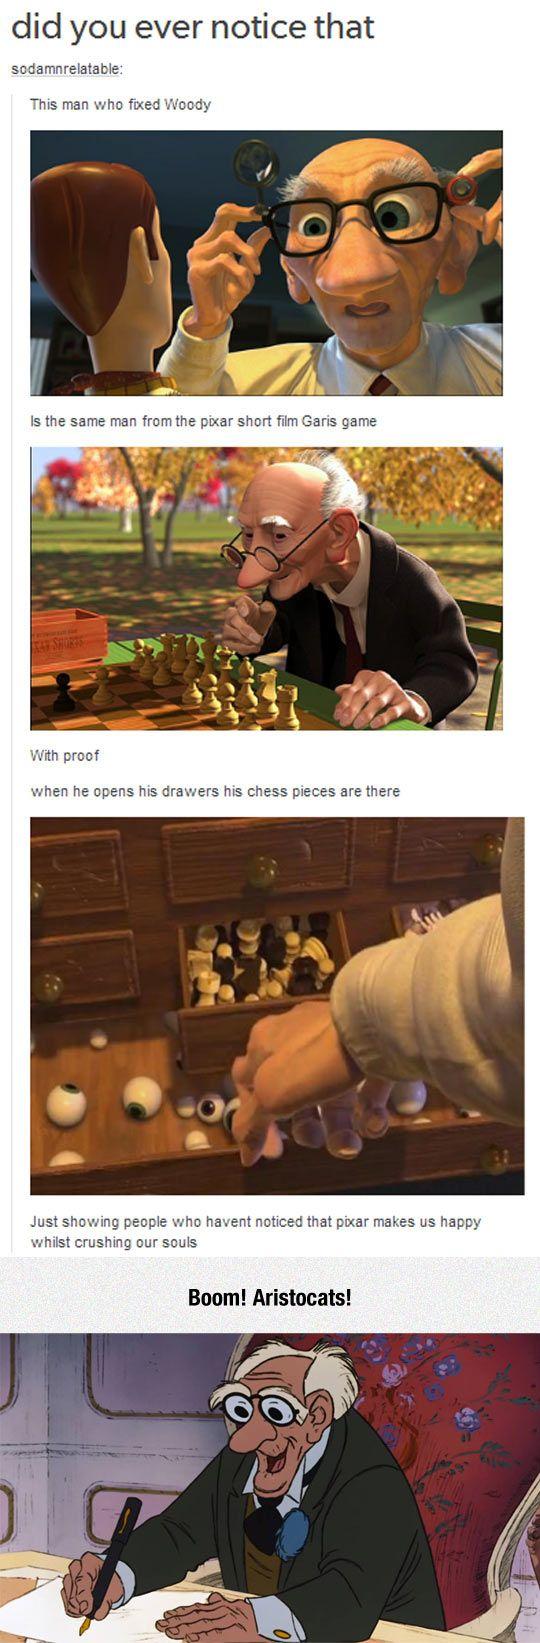 Disney/Pixar's Old Man